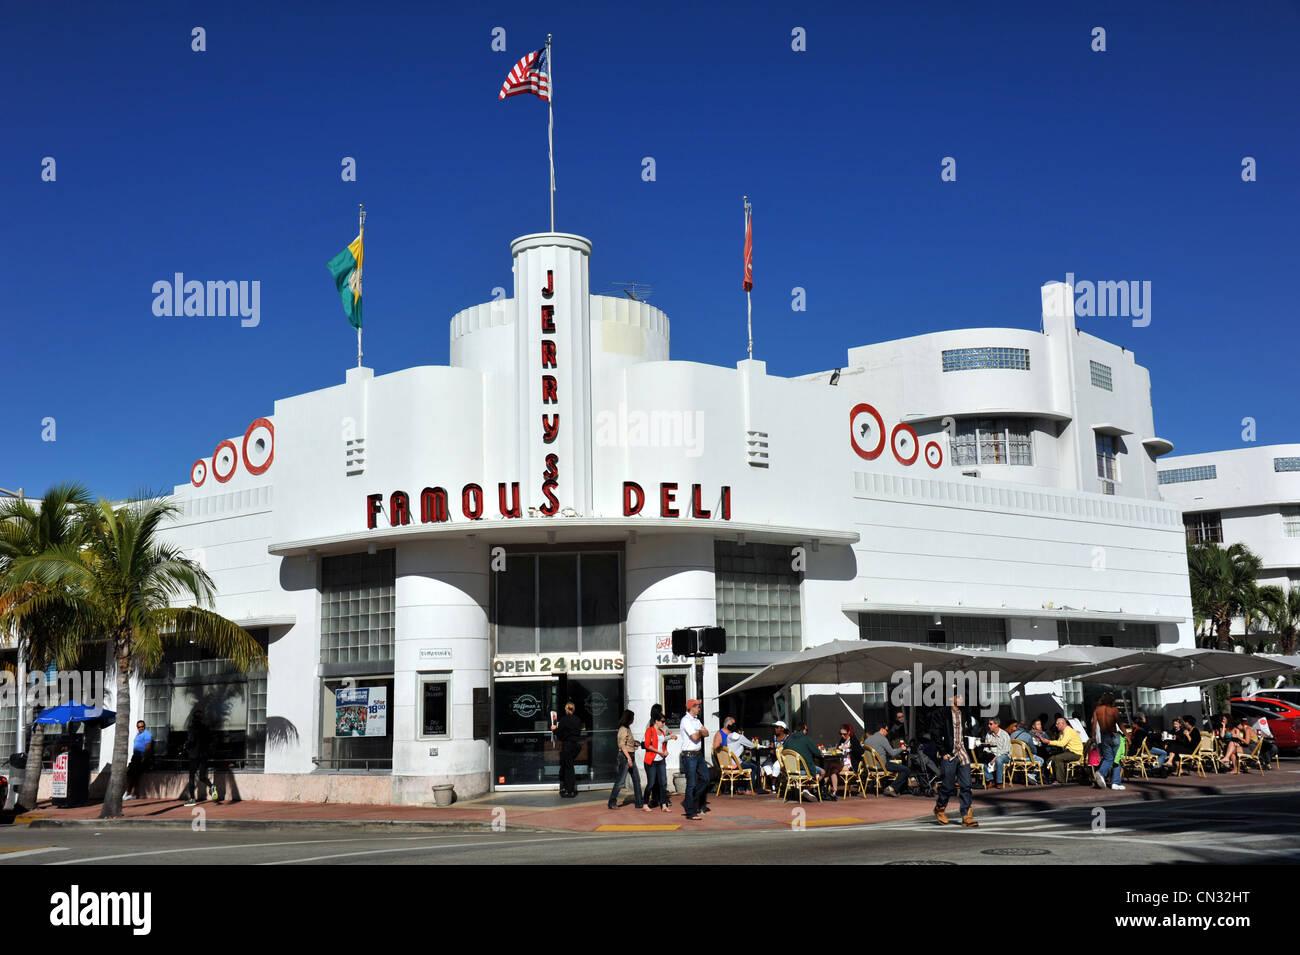 Jerry's Famous Deli, Miami, Florida, USA - Stock Image